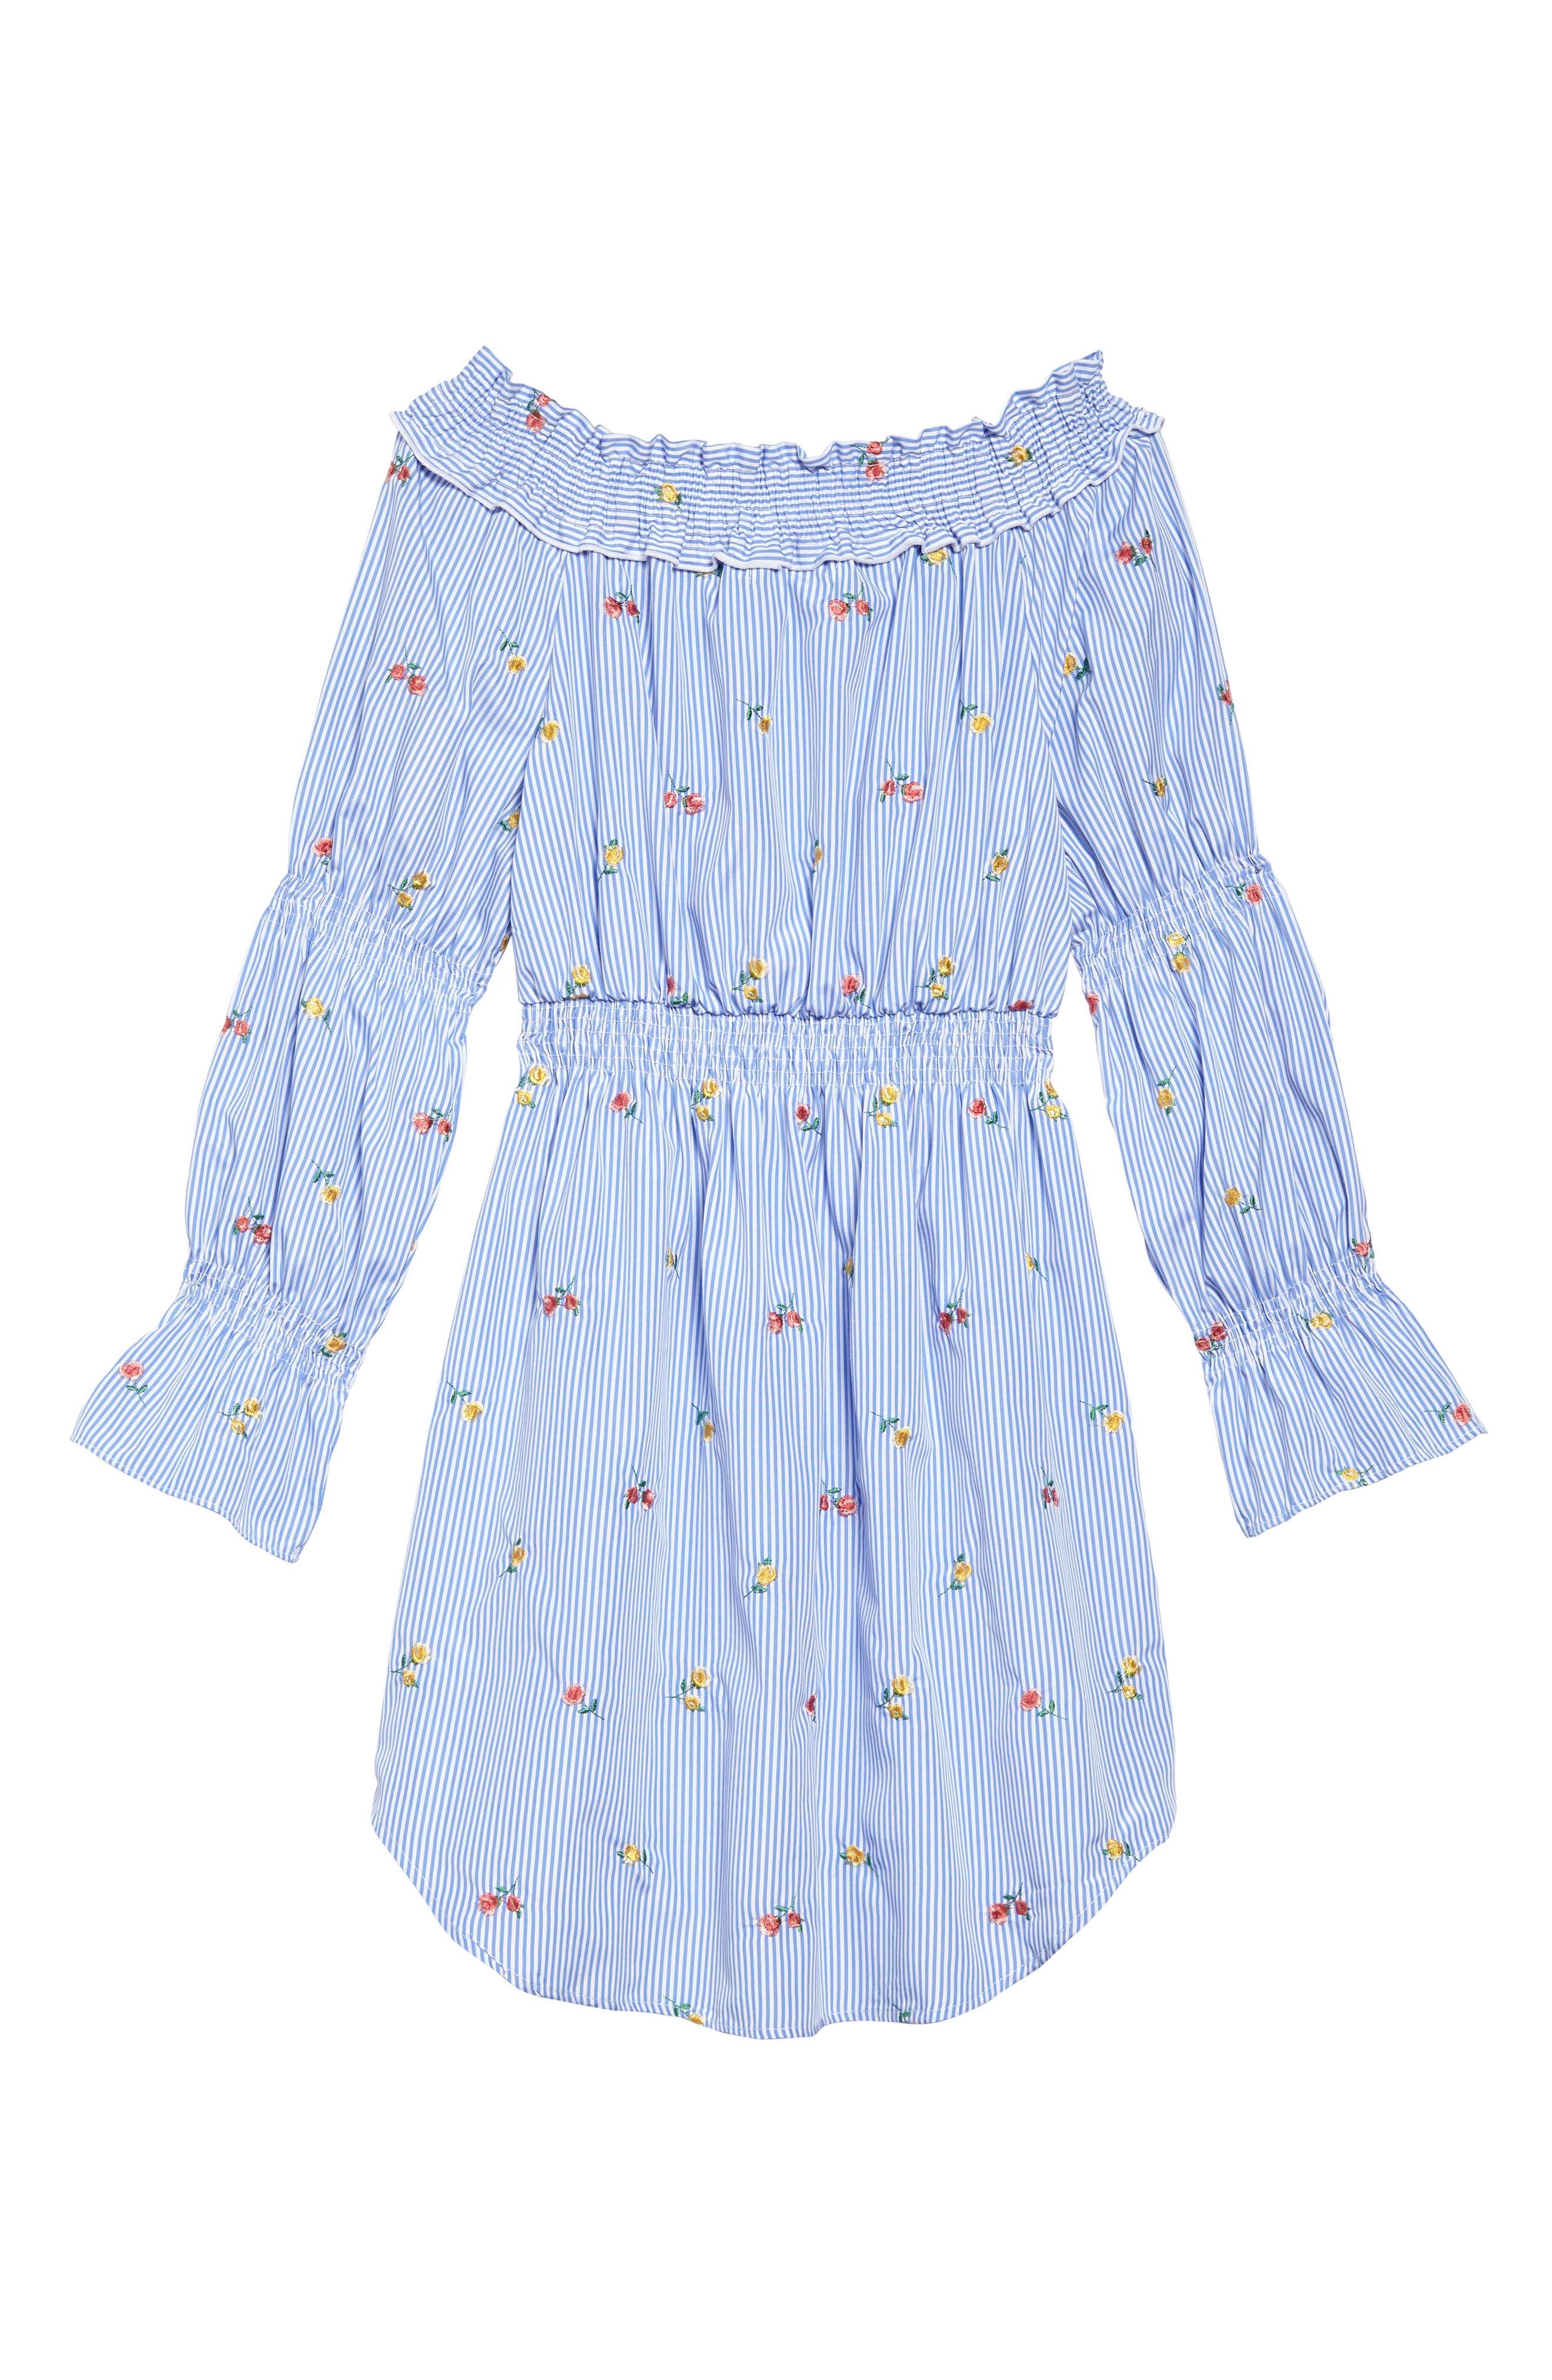 Floral Embroidery Stripe Off the Shoulder Dress,                             Alternate thumbnail 2, color,                             Light Blue/ White